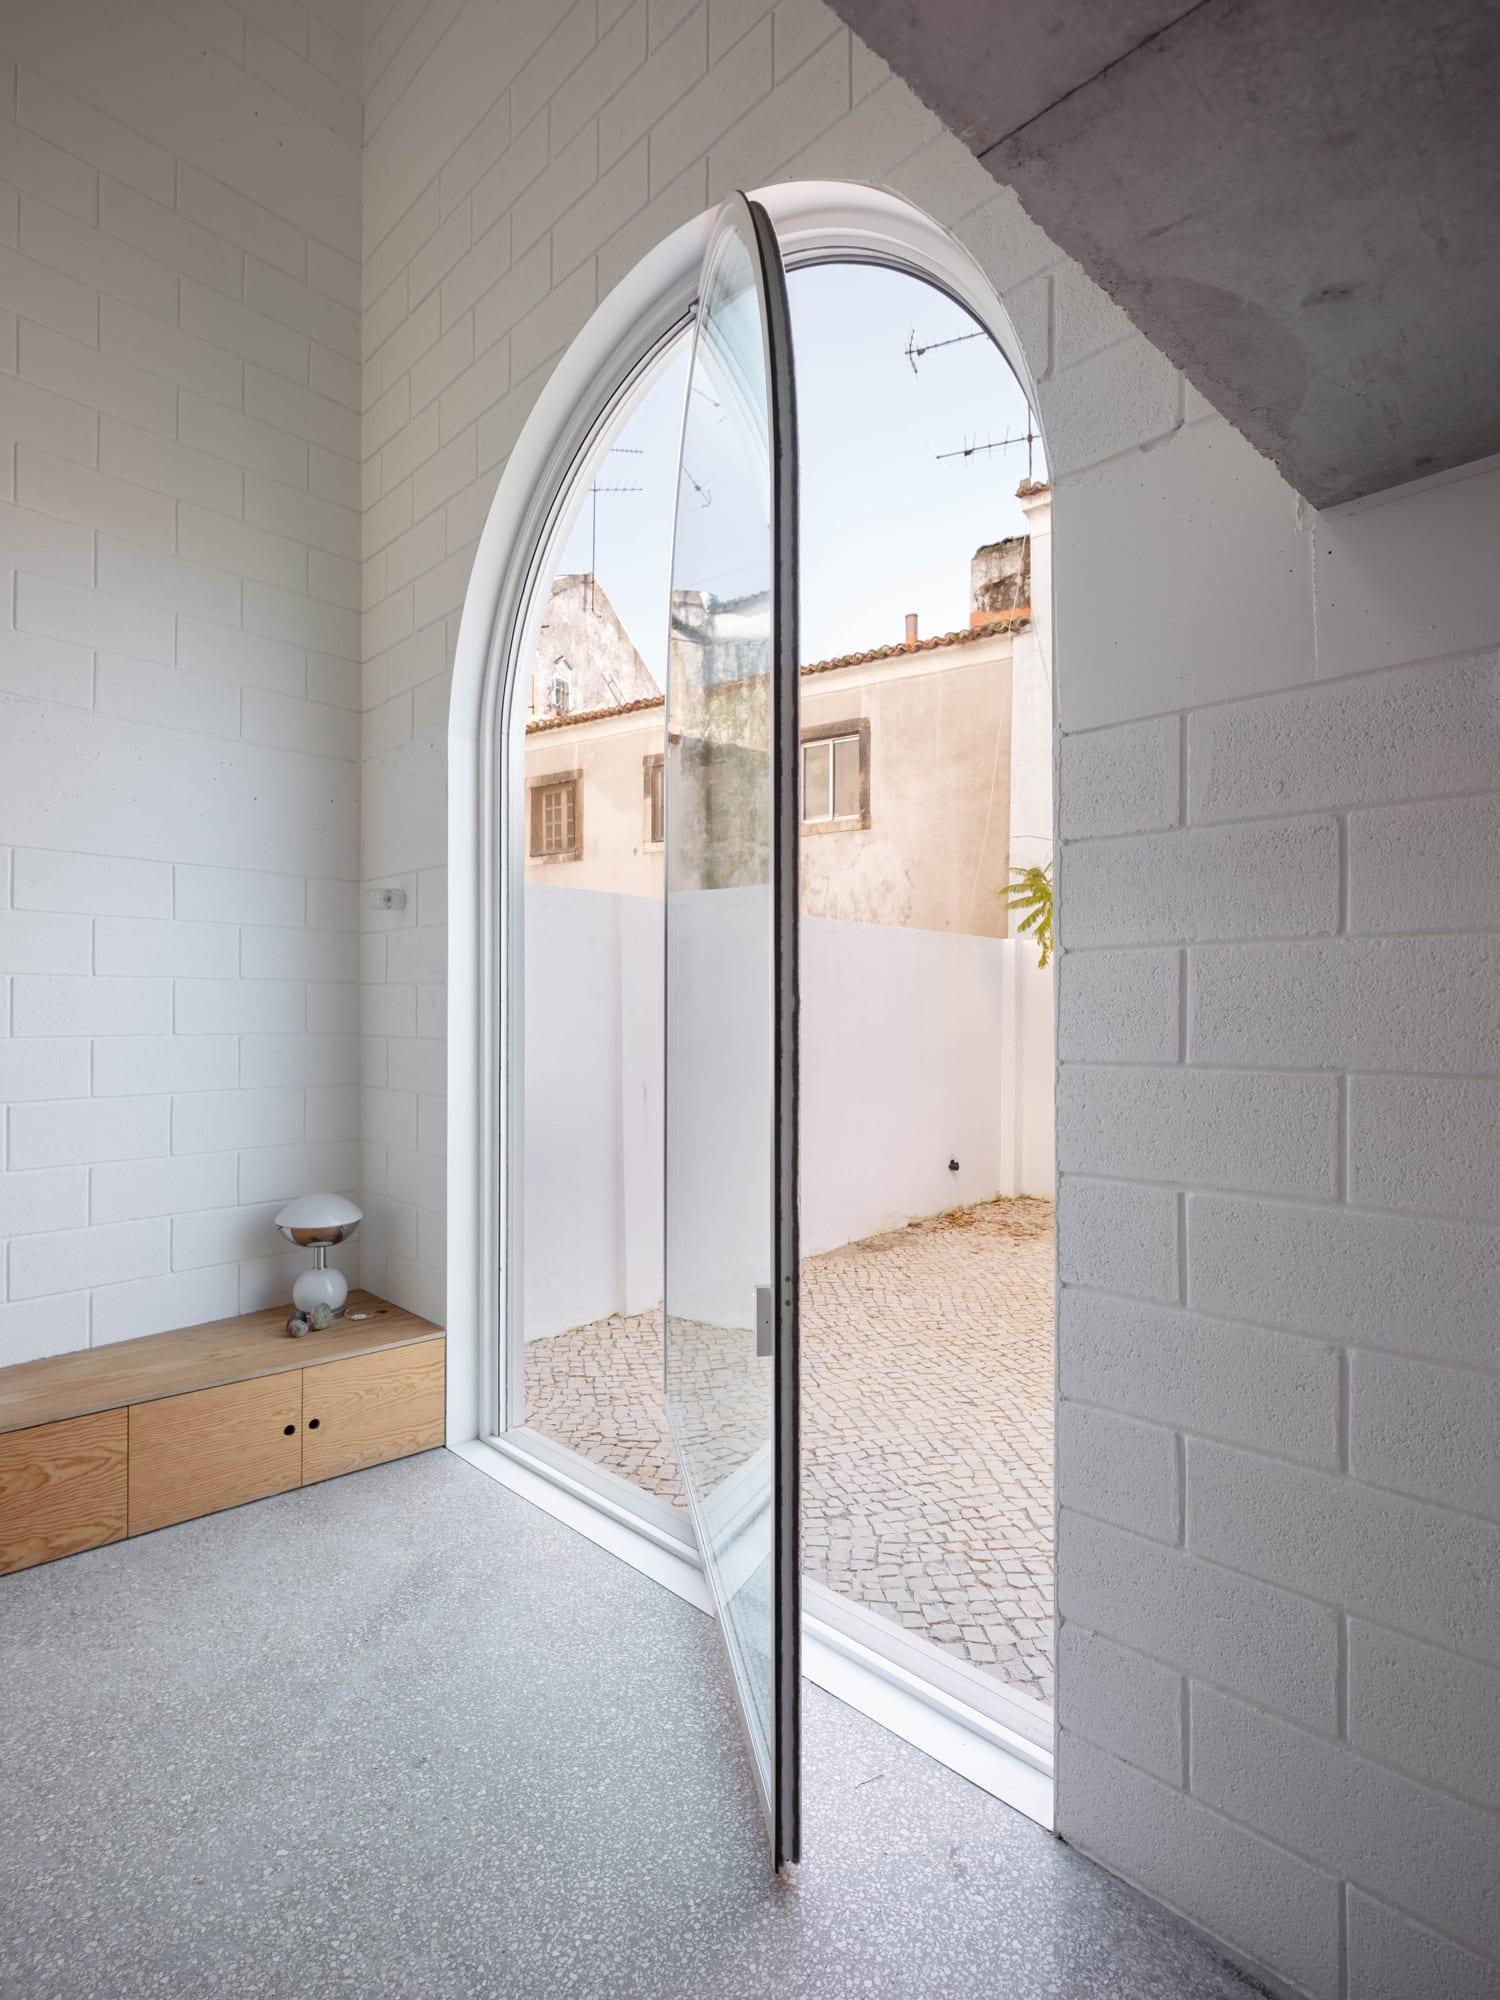 Dodged House In Lisbon By Leopold Banchini Daniel Zamarbide Yellowtrace 03